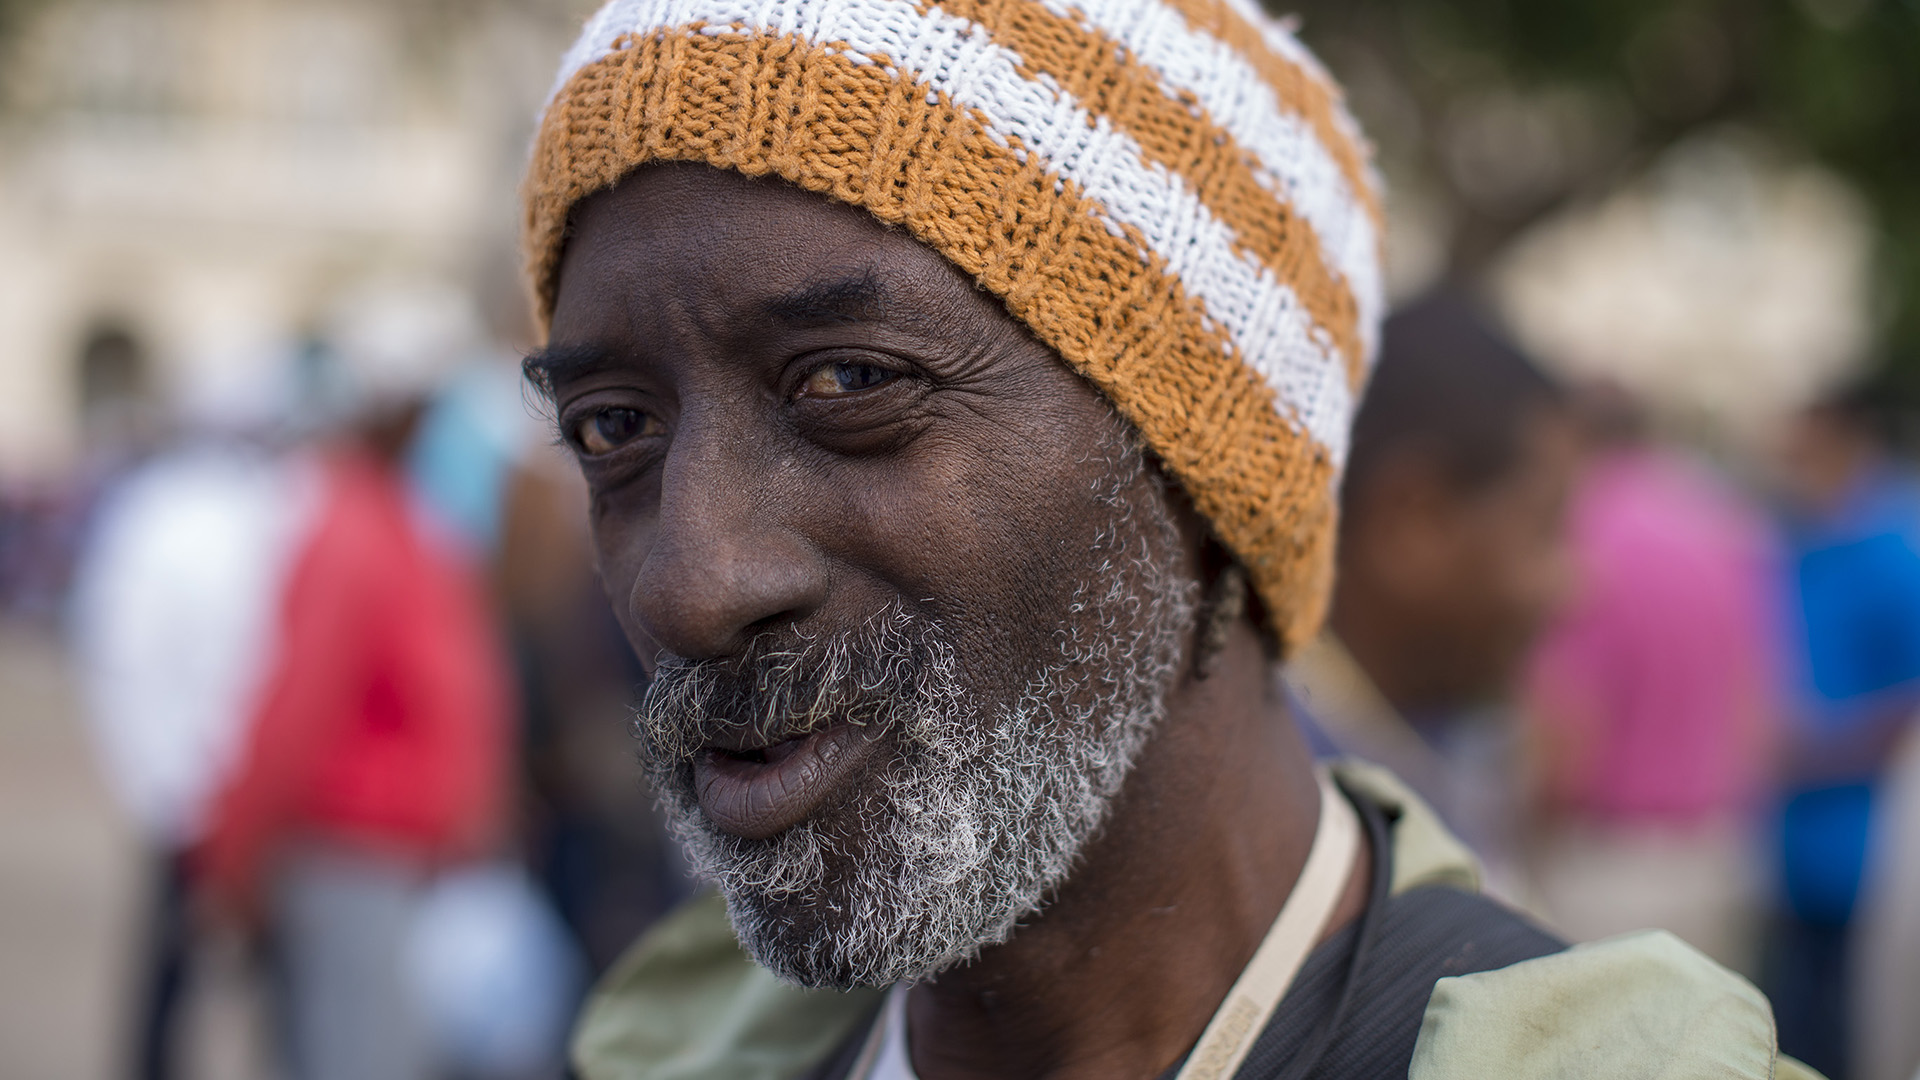 20180115 Havana 043 (1) (1) (1) (1)